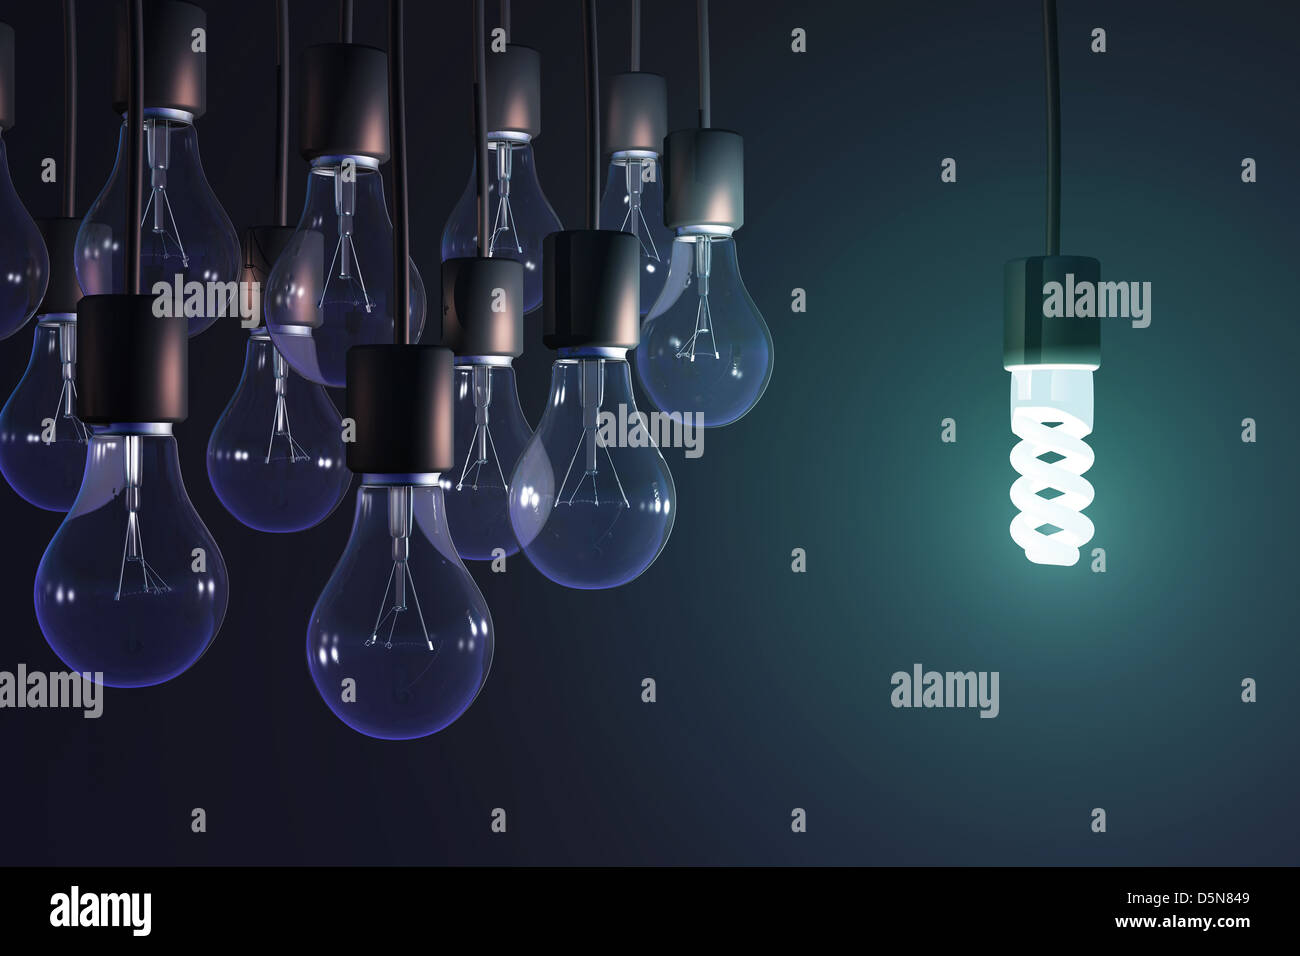 Lâmpada economizadora de energia entre a lâmpada de cinza Imagens de Stock